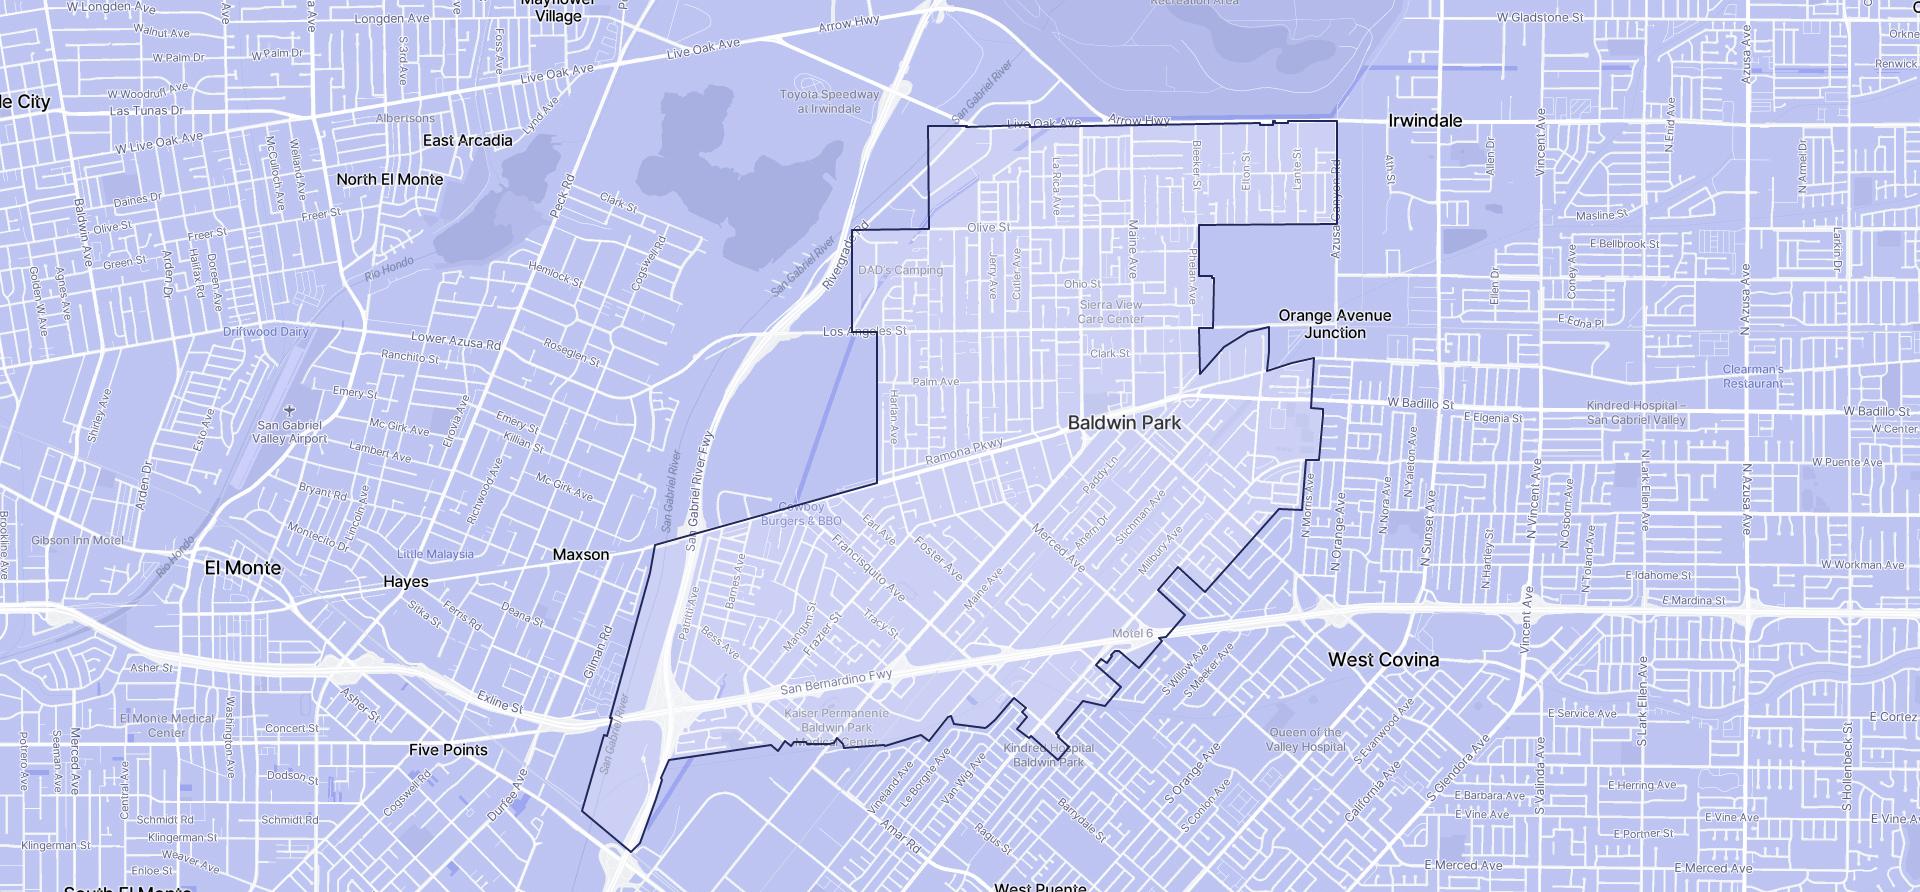 Image of Baldwin Park boundaries on a map.